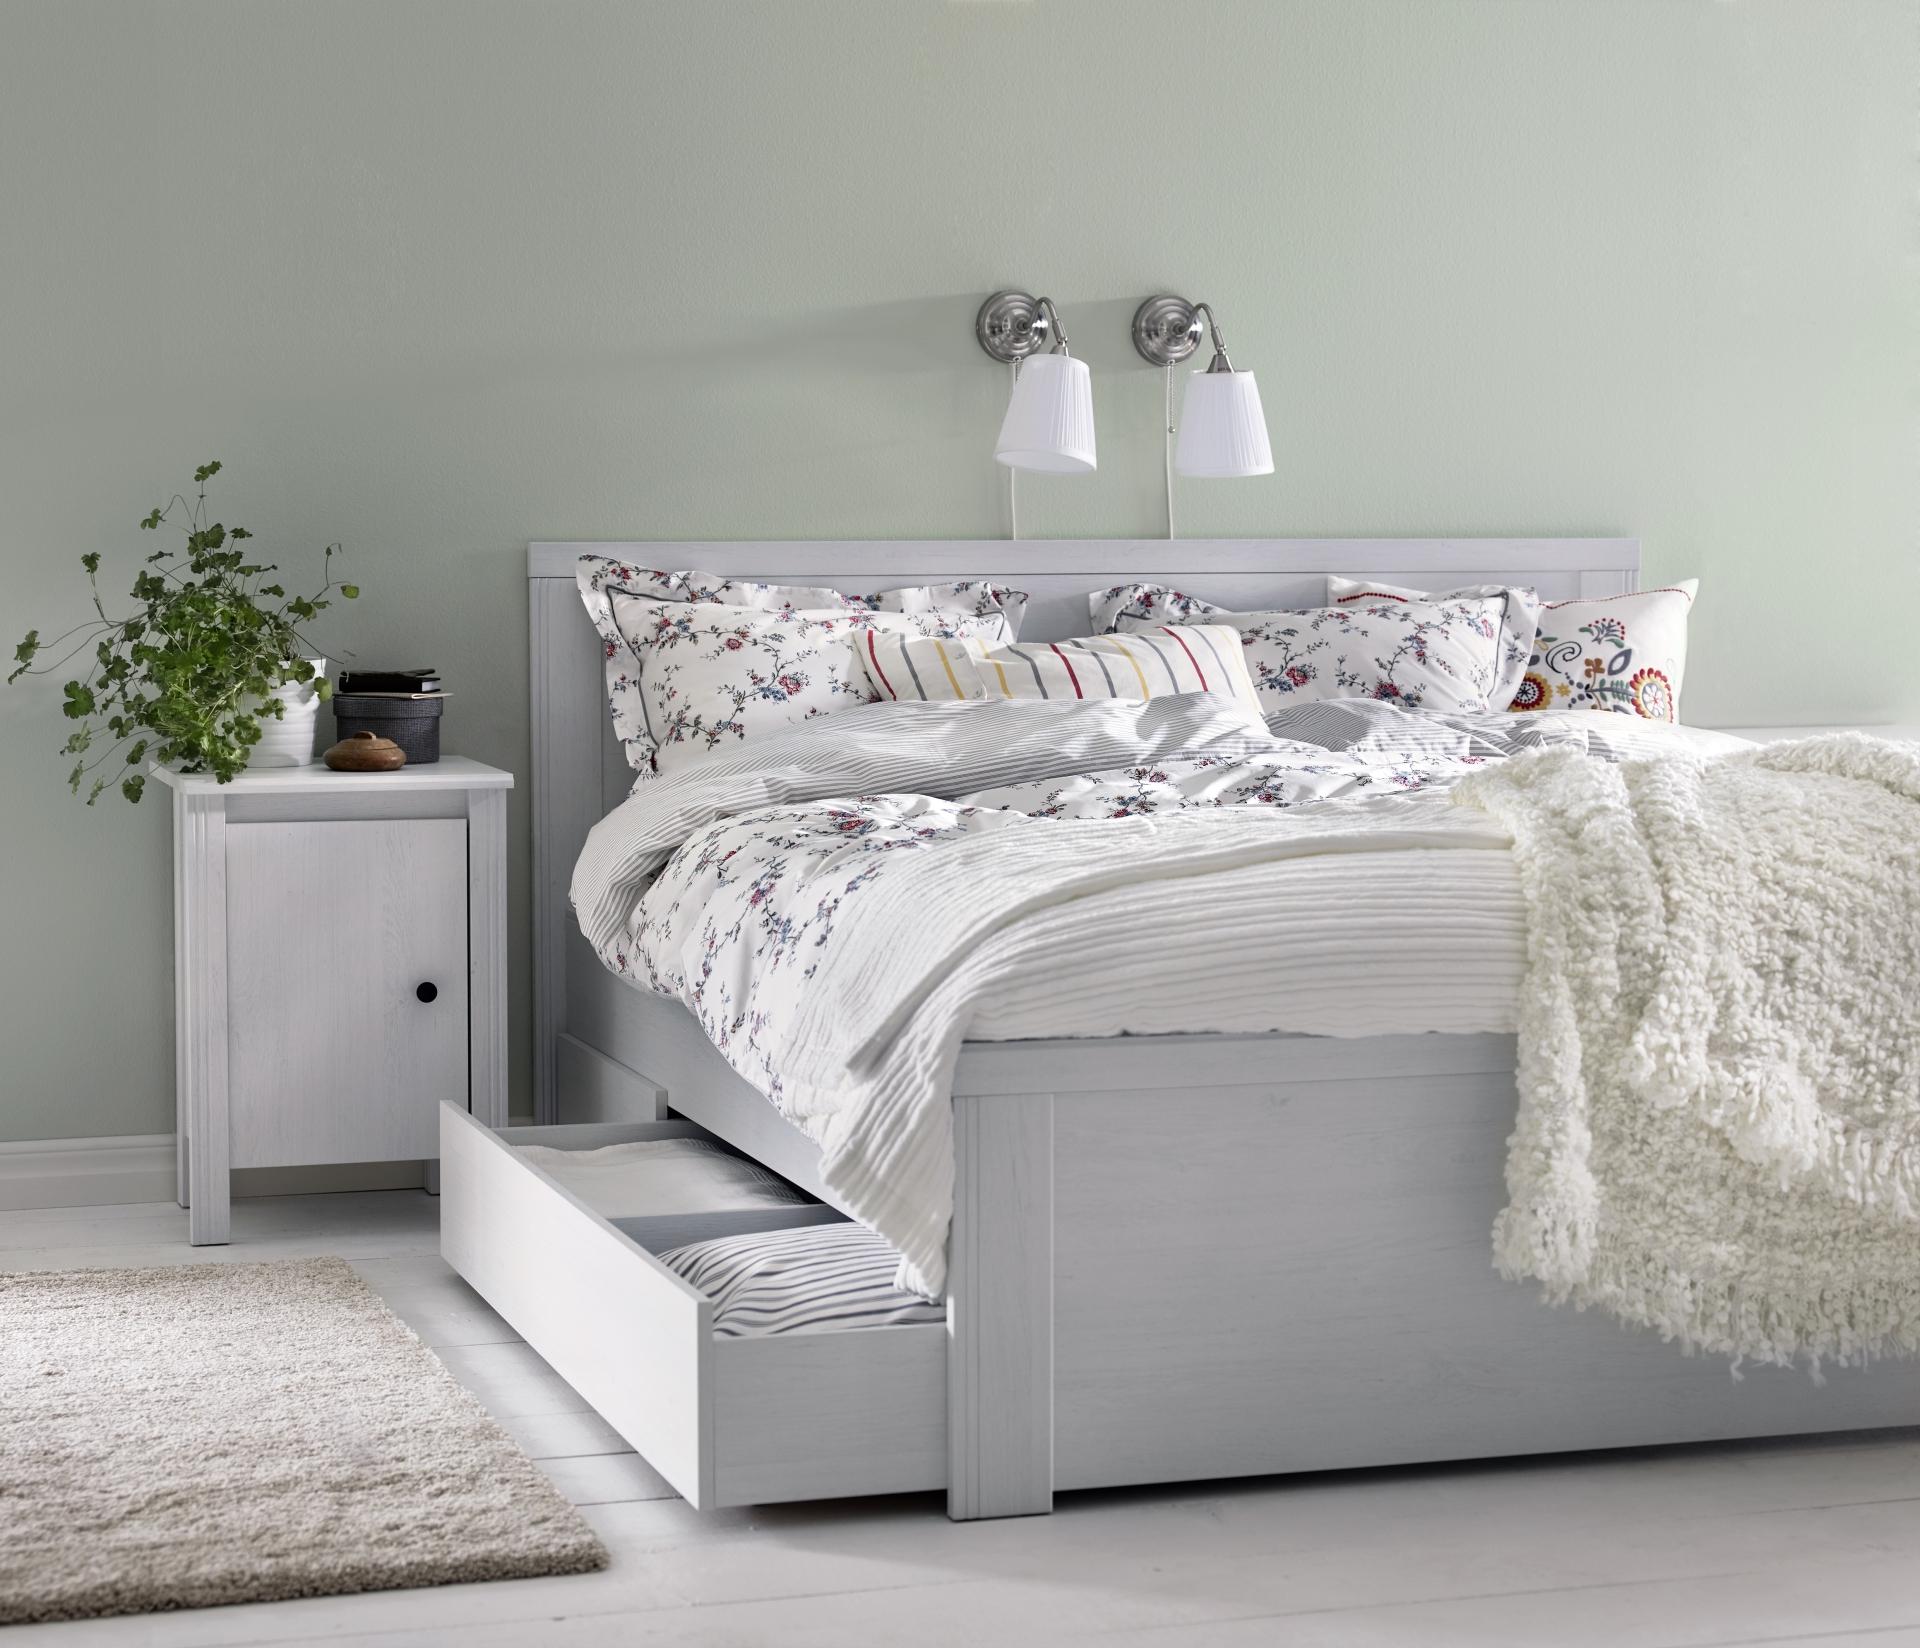 organizar ropa cama